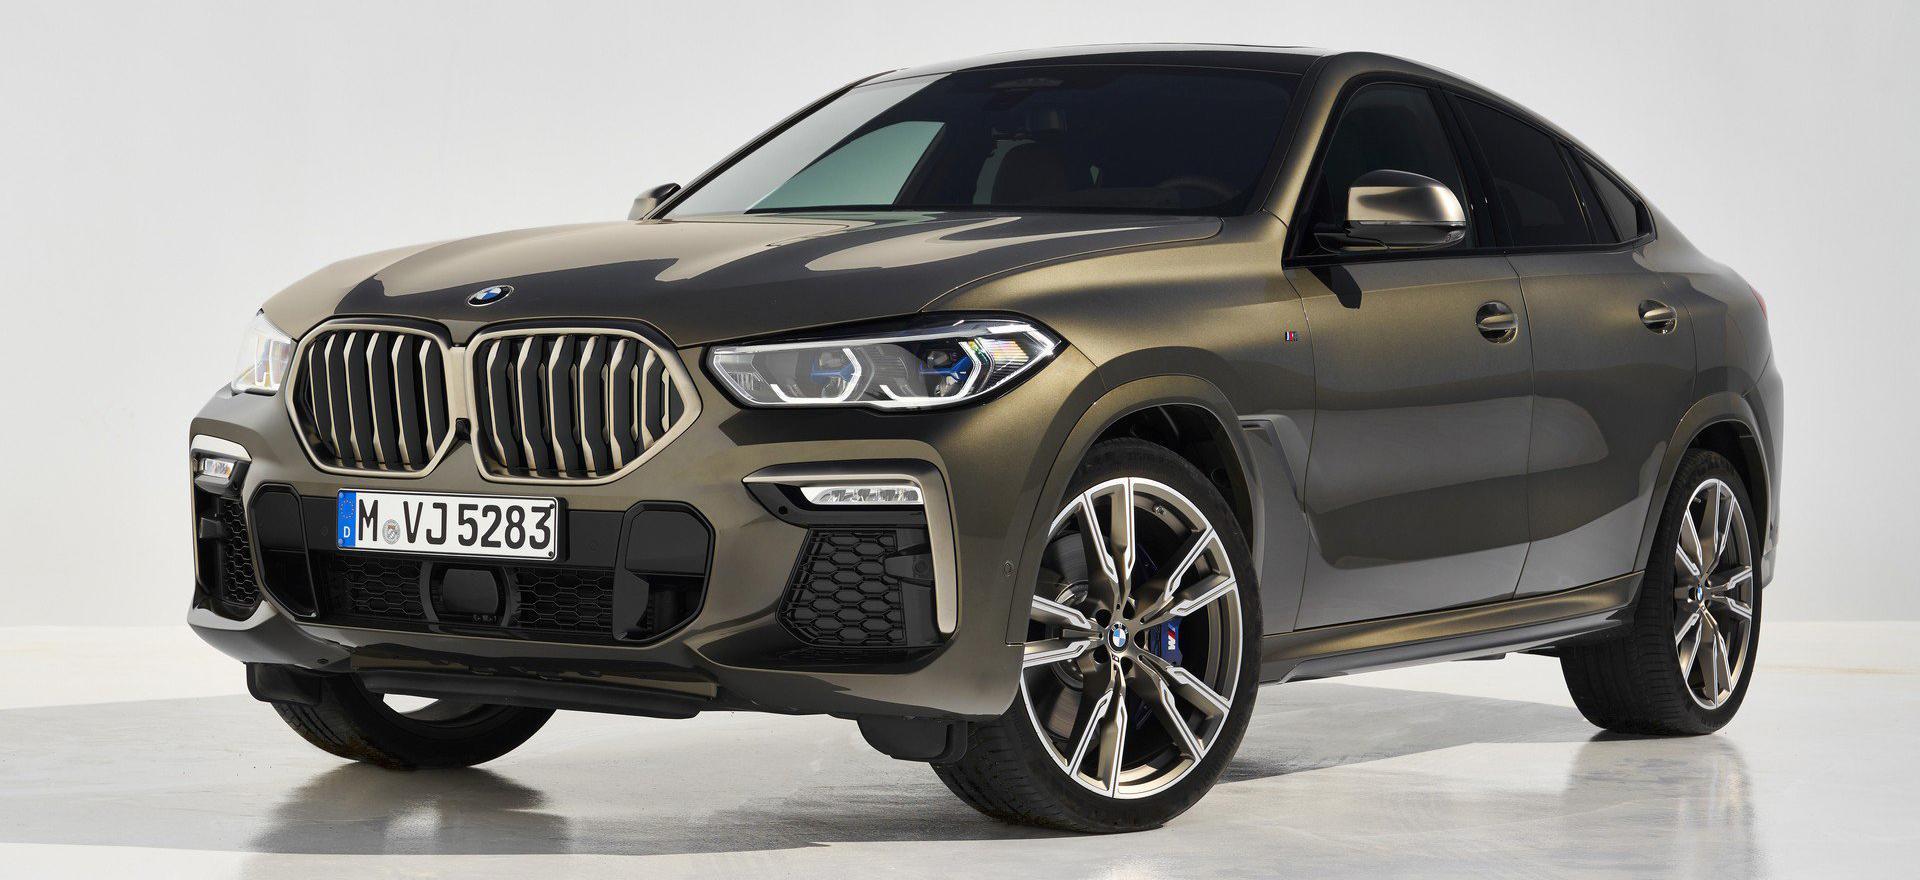 Представлен новый BMW X6